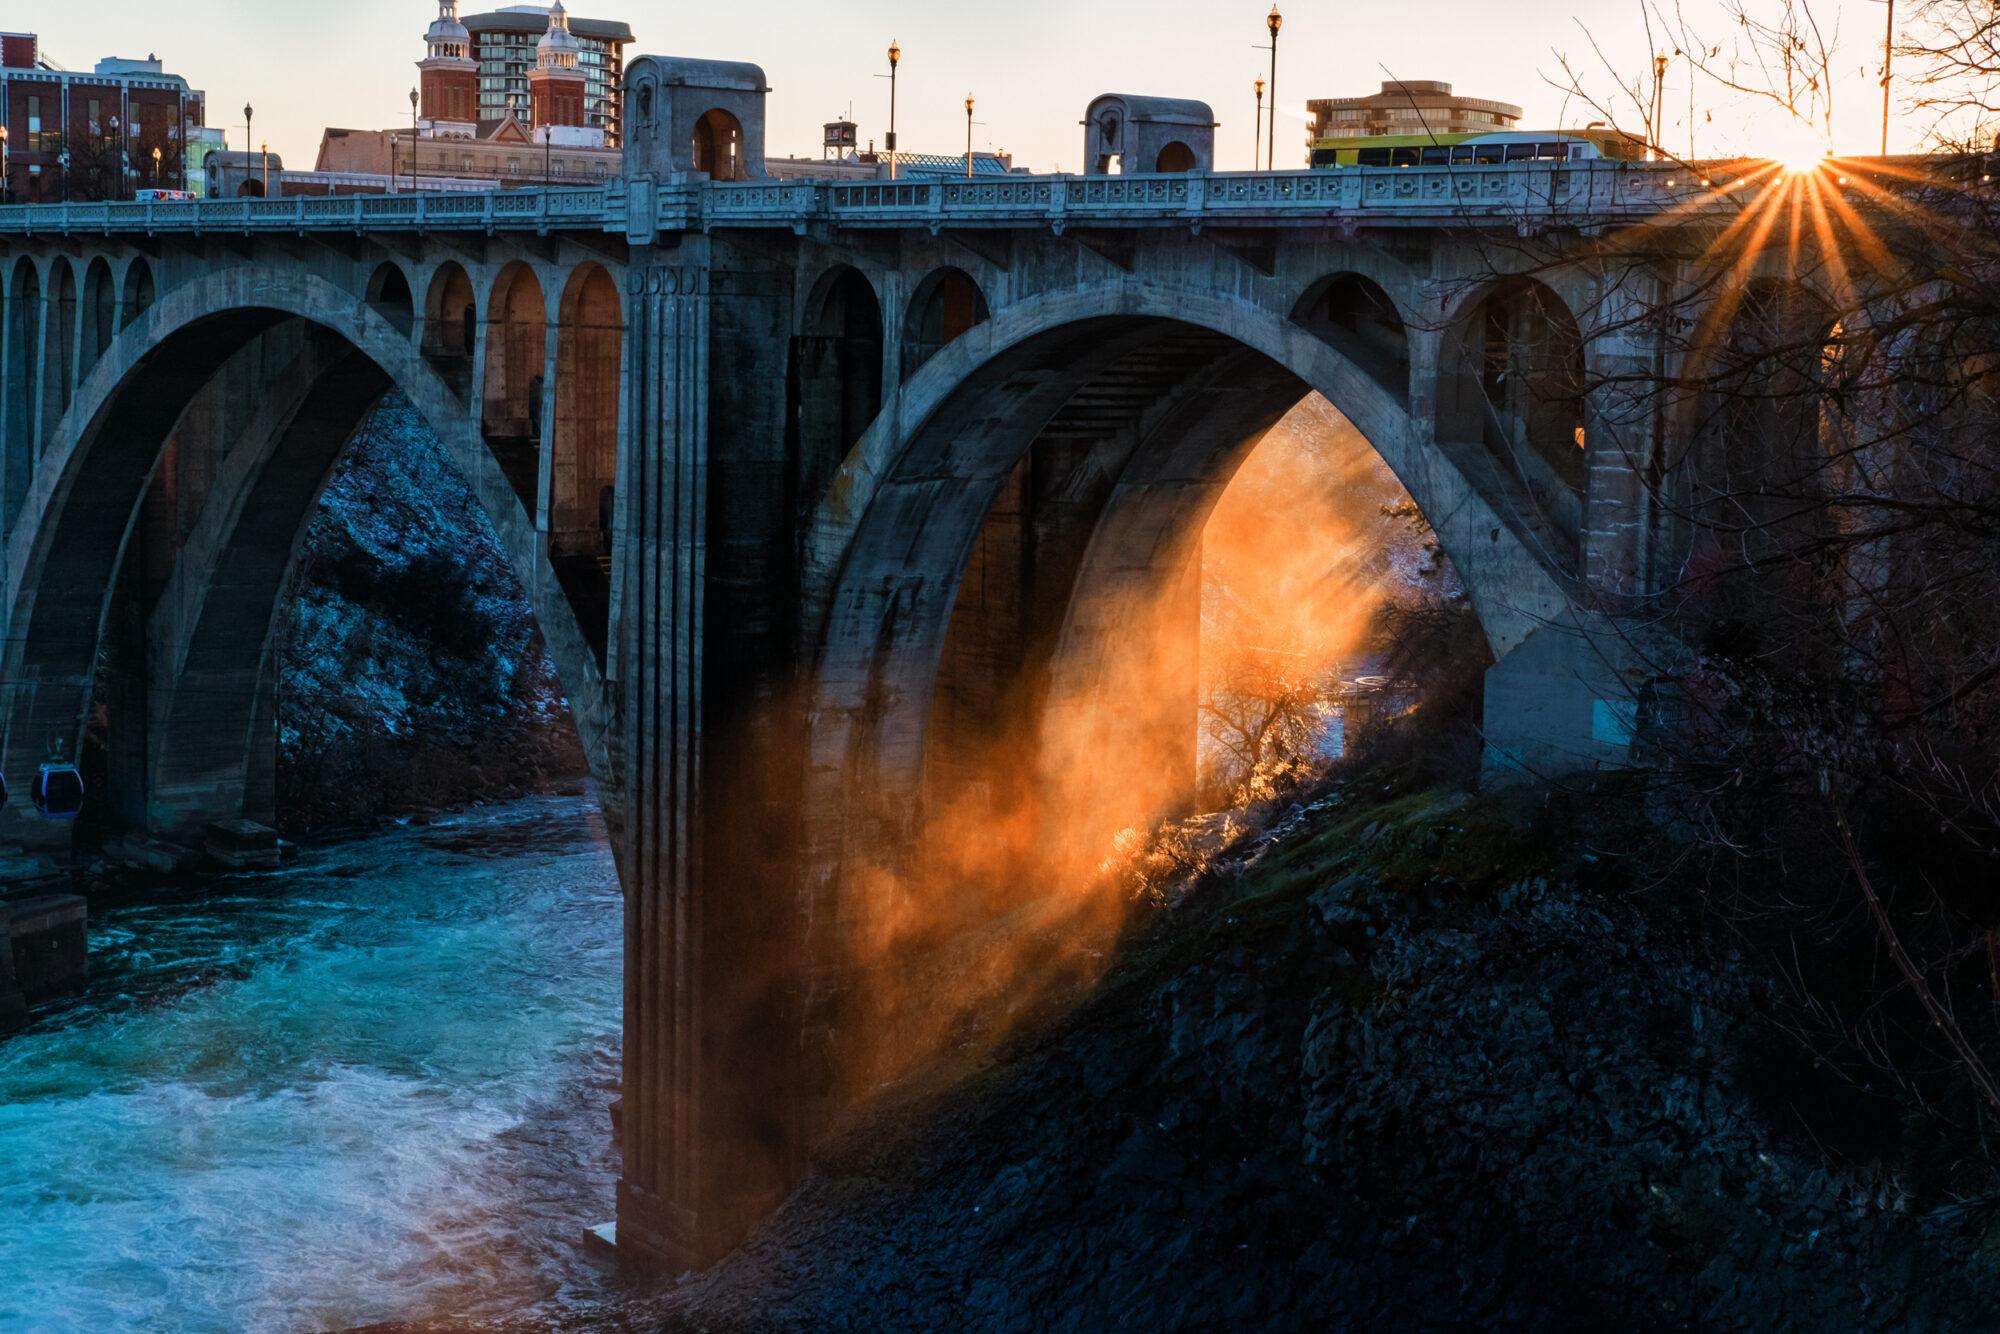 Downtown Spokane River Bridge at Sunset